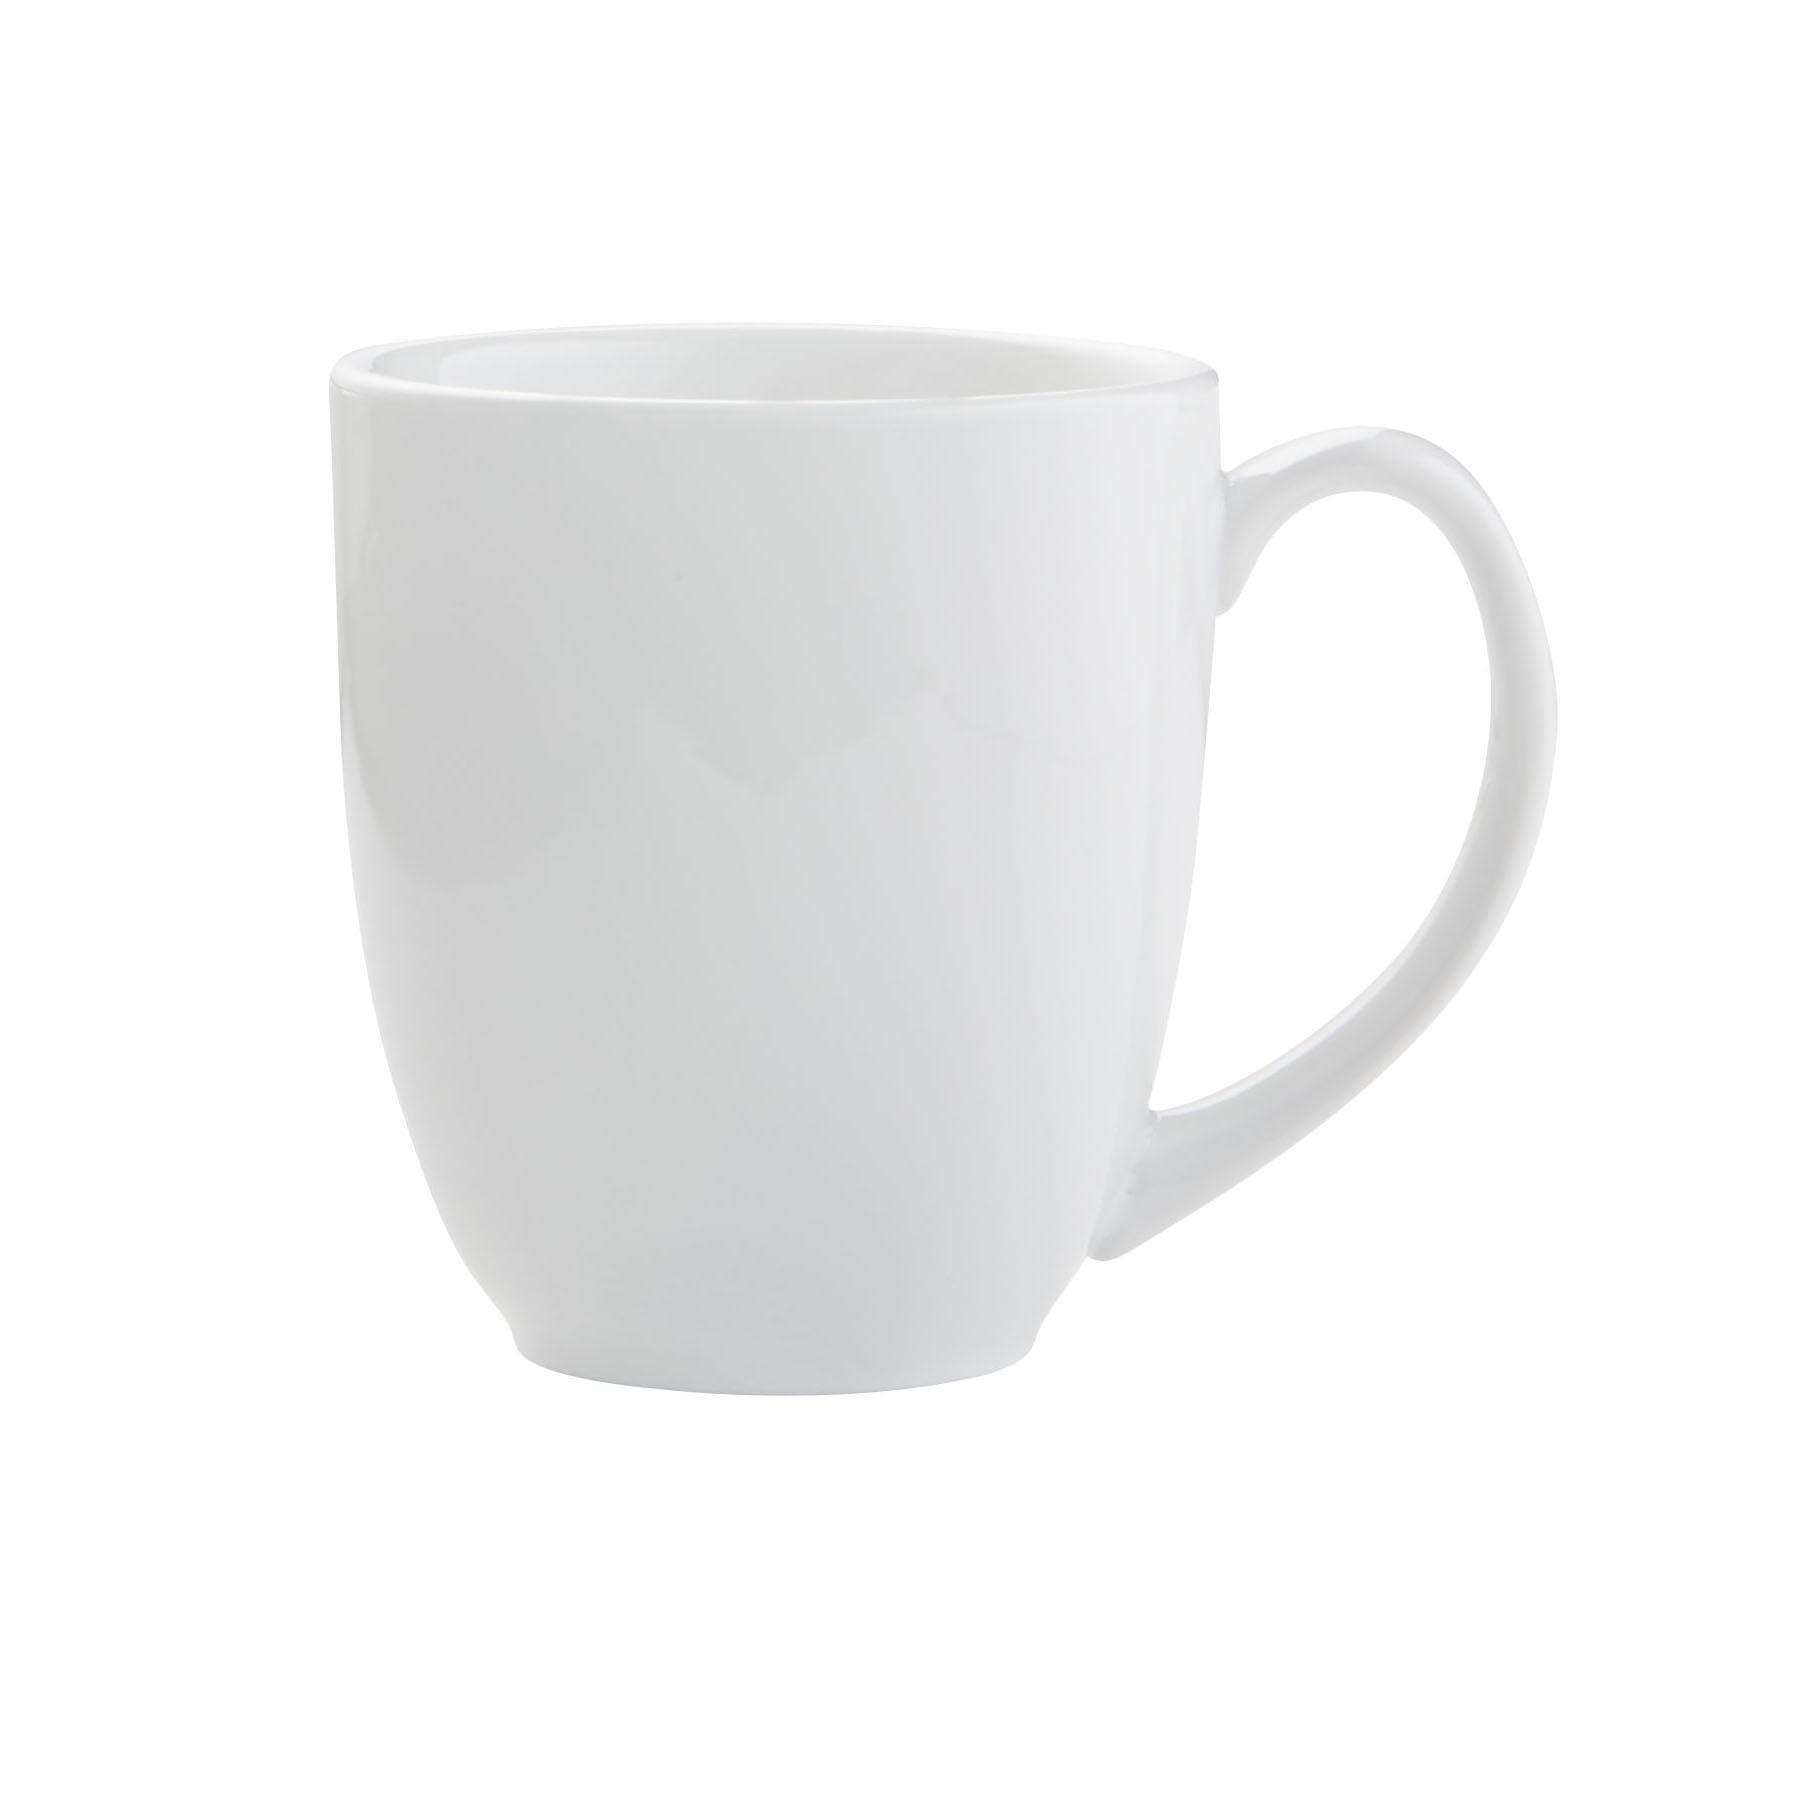 Cardinal FJ834 mug, china